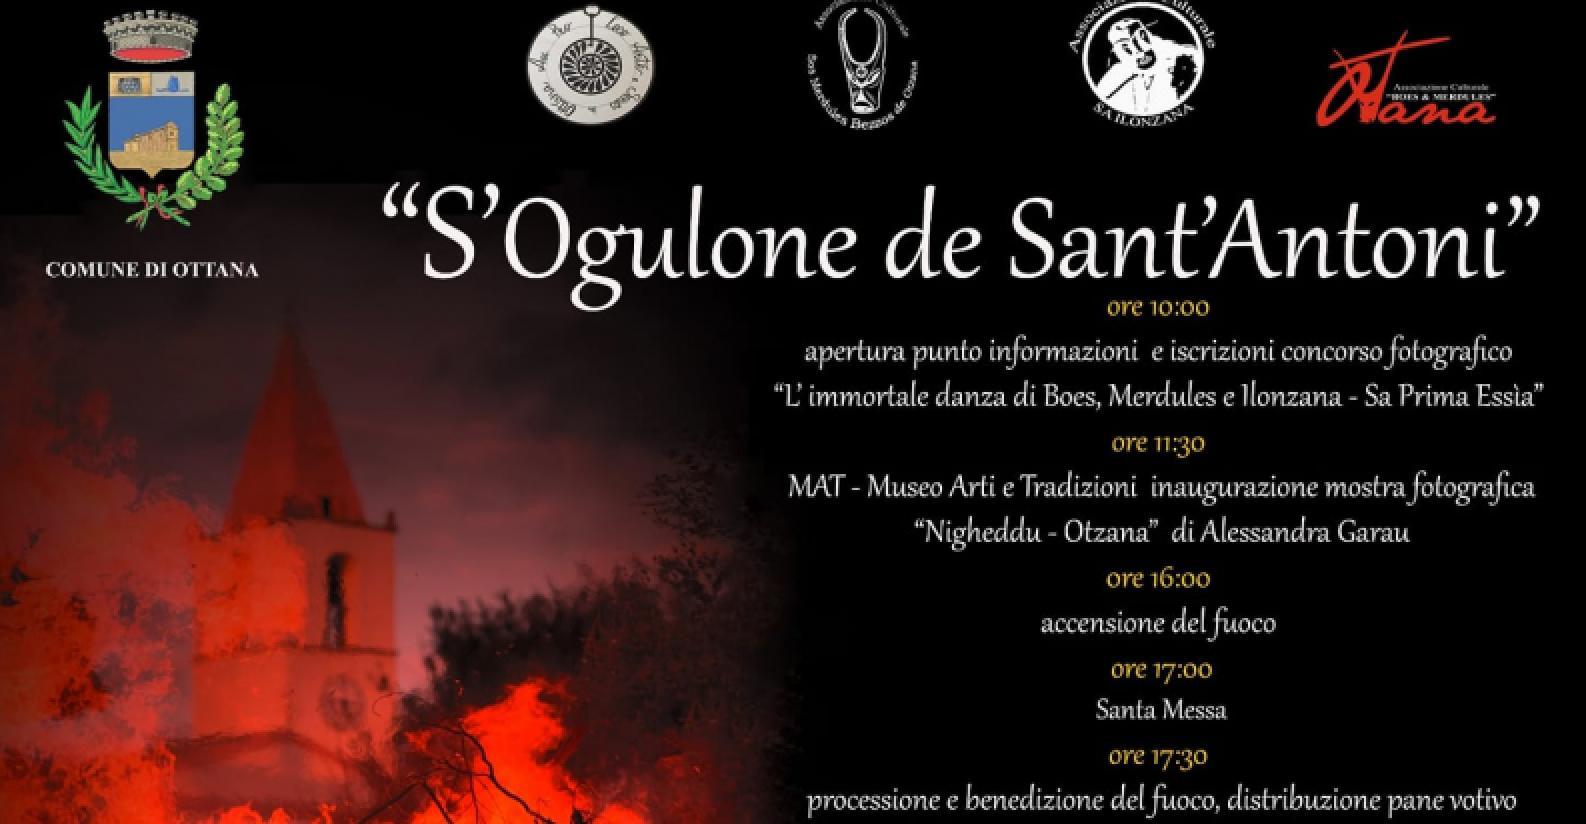 ottana_sogulone_del_santantoni_2020